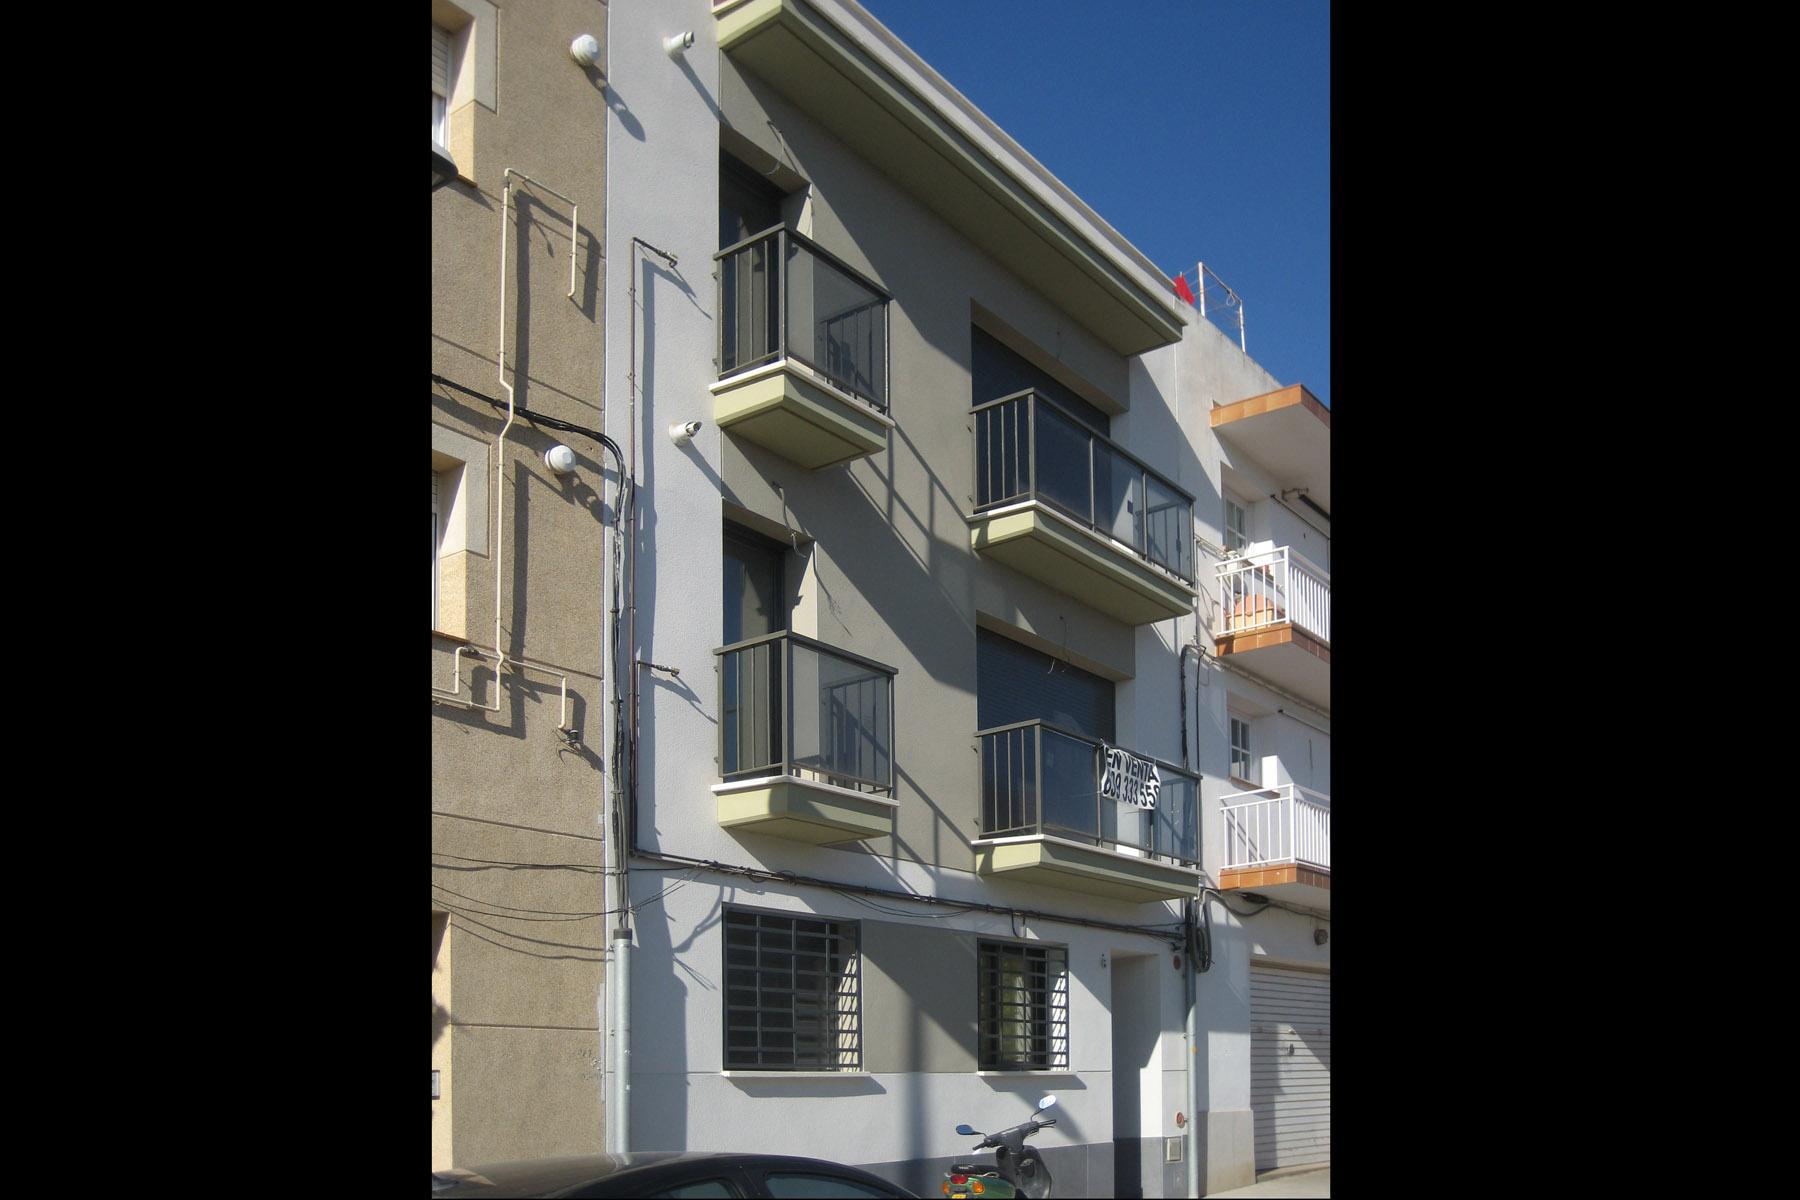 Habitatge-Plurifamiliar-Subur-Sant-Pere-Ribes-Barcelona-01